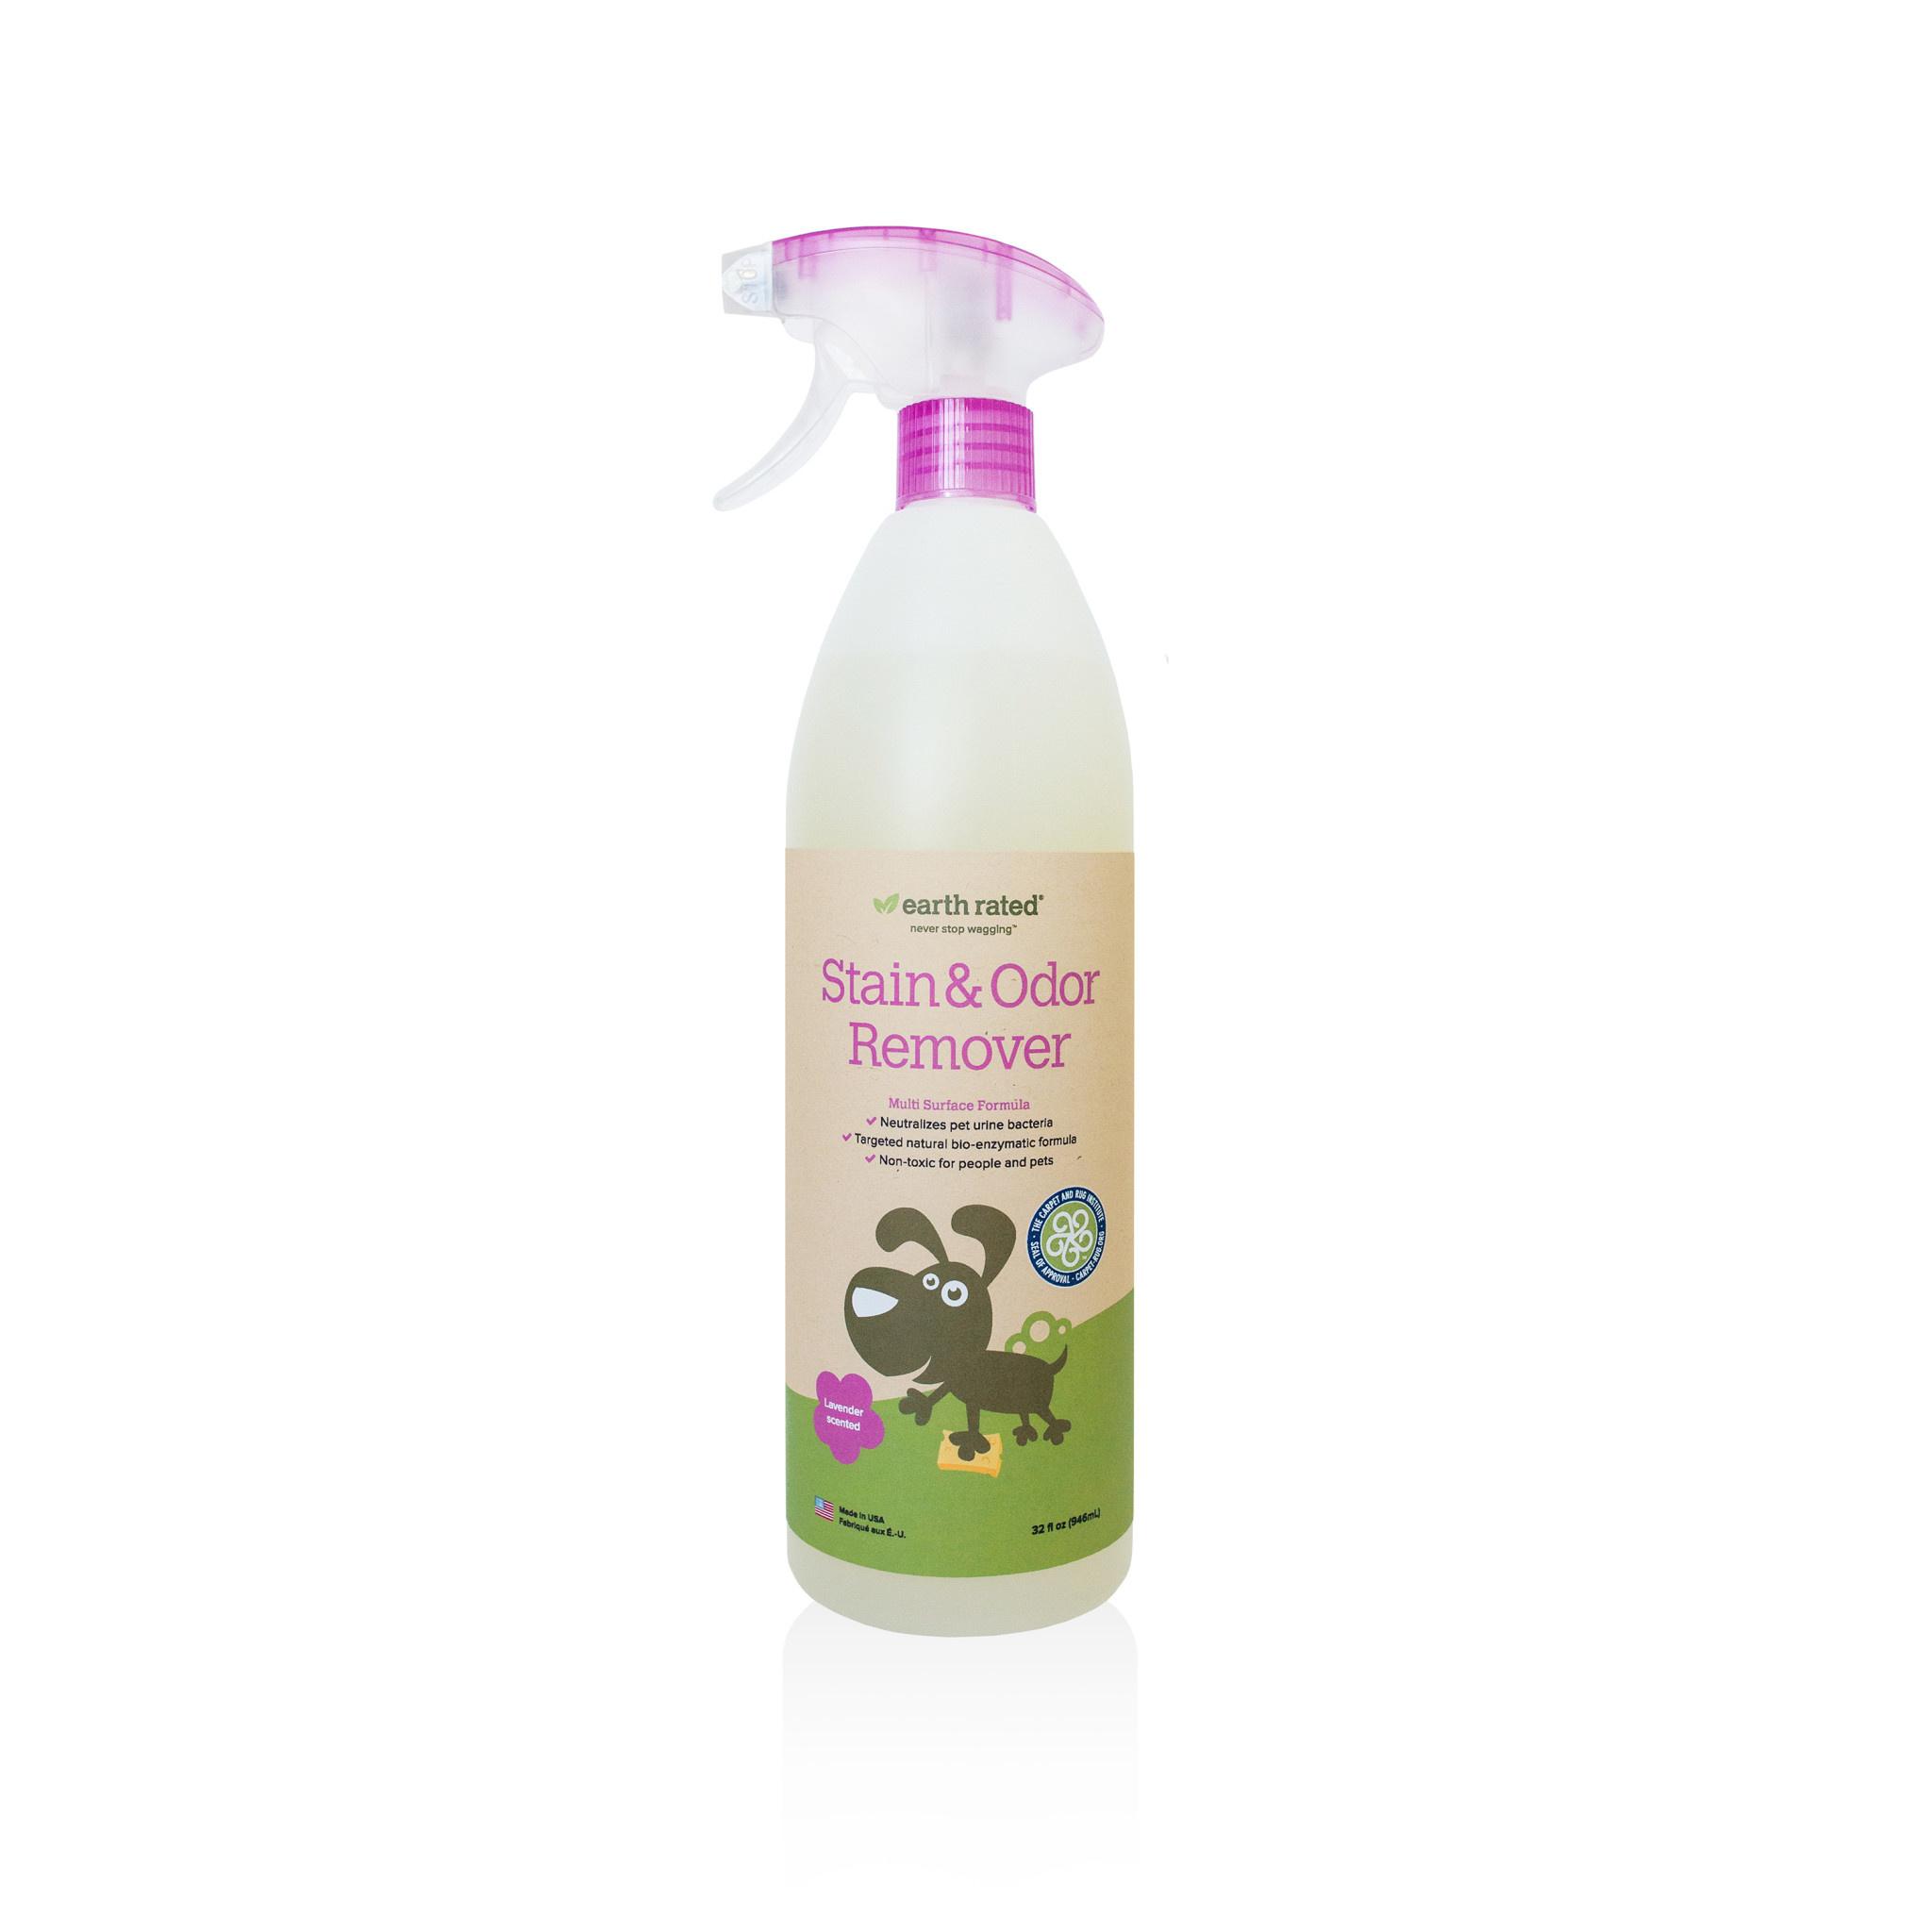 Stain & Odor Remover Lavender Scent 32oz